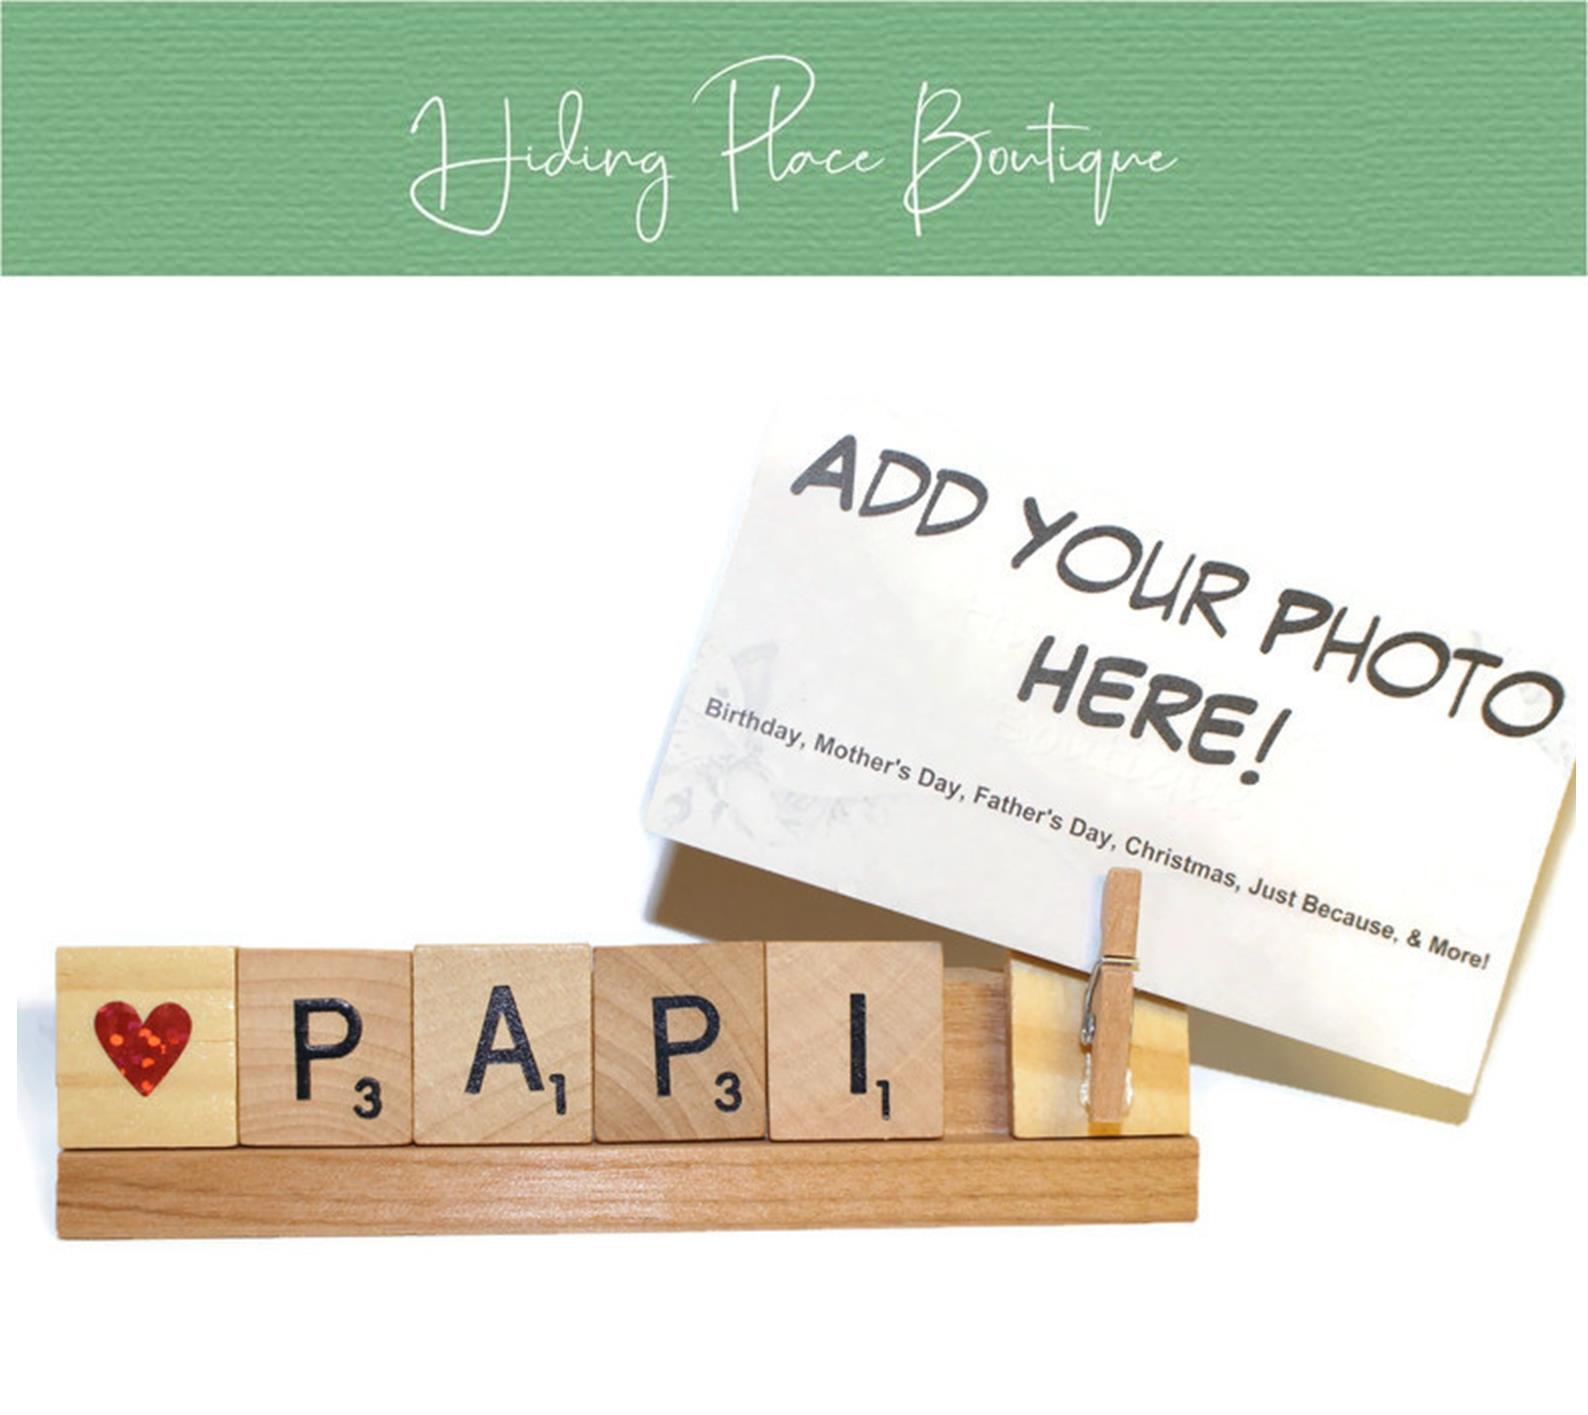 papi photo frame